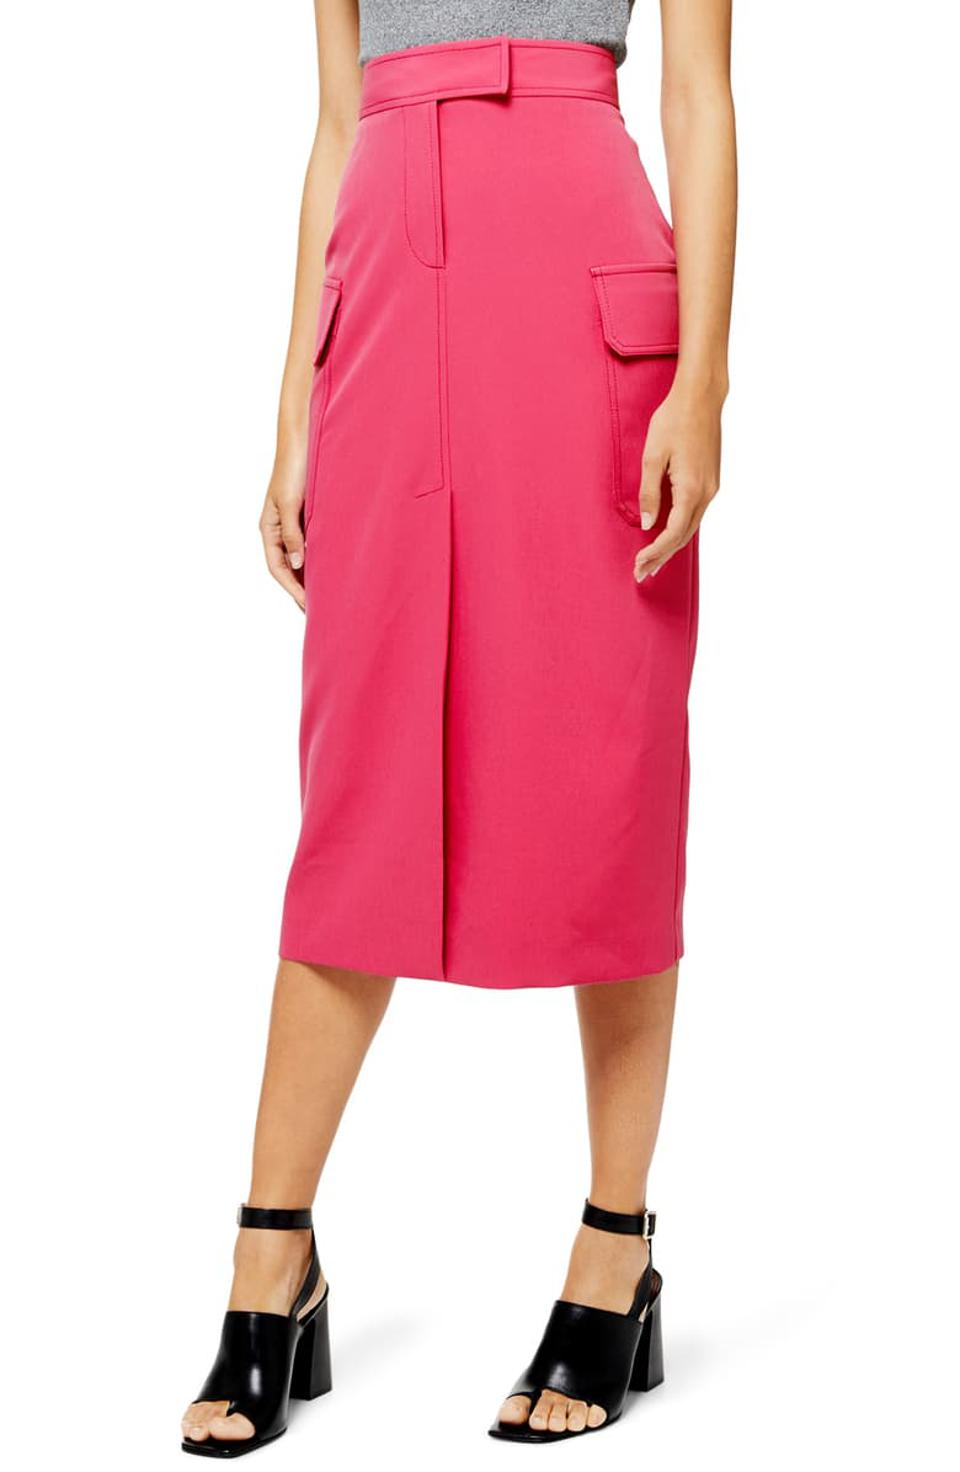 Topshop Utility Midi Skirt